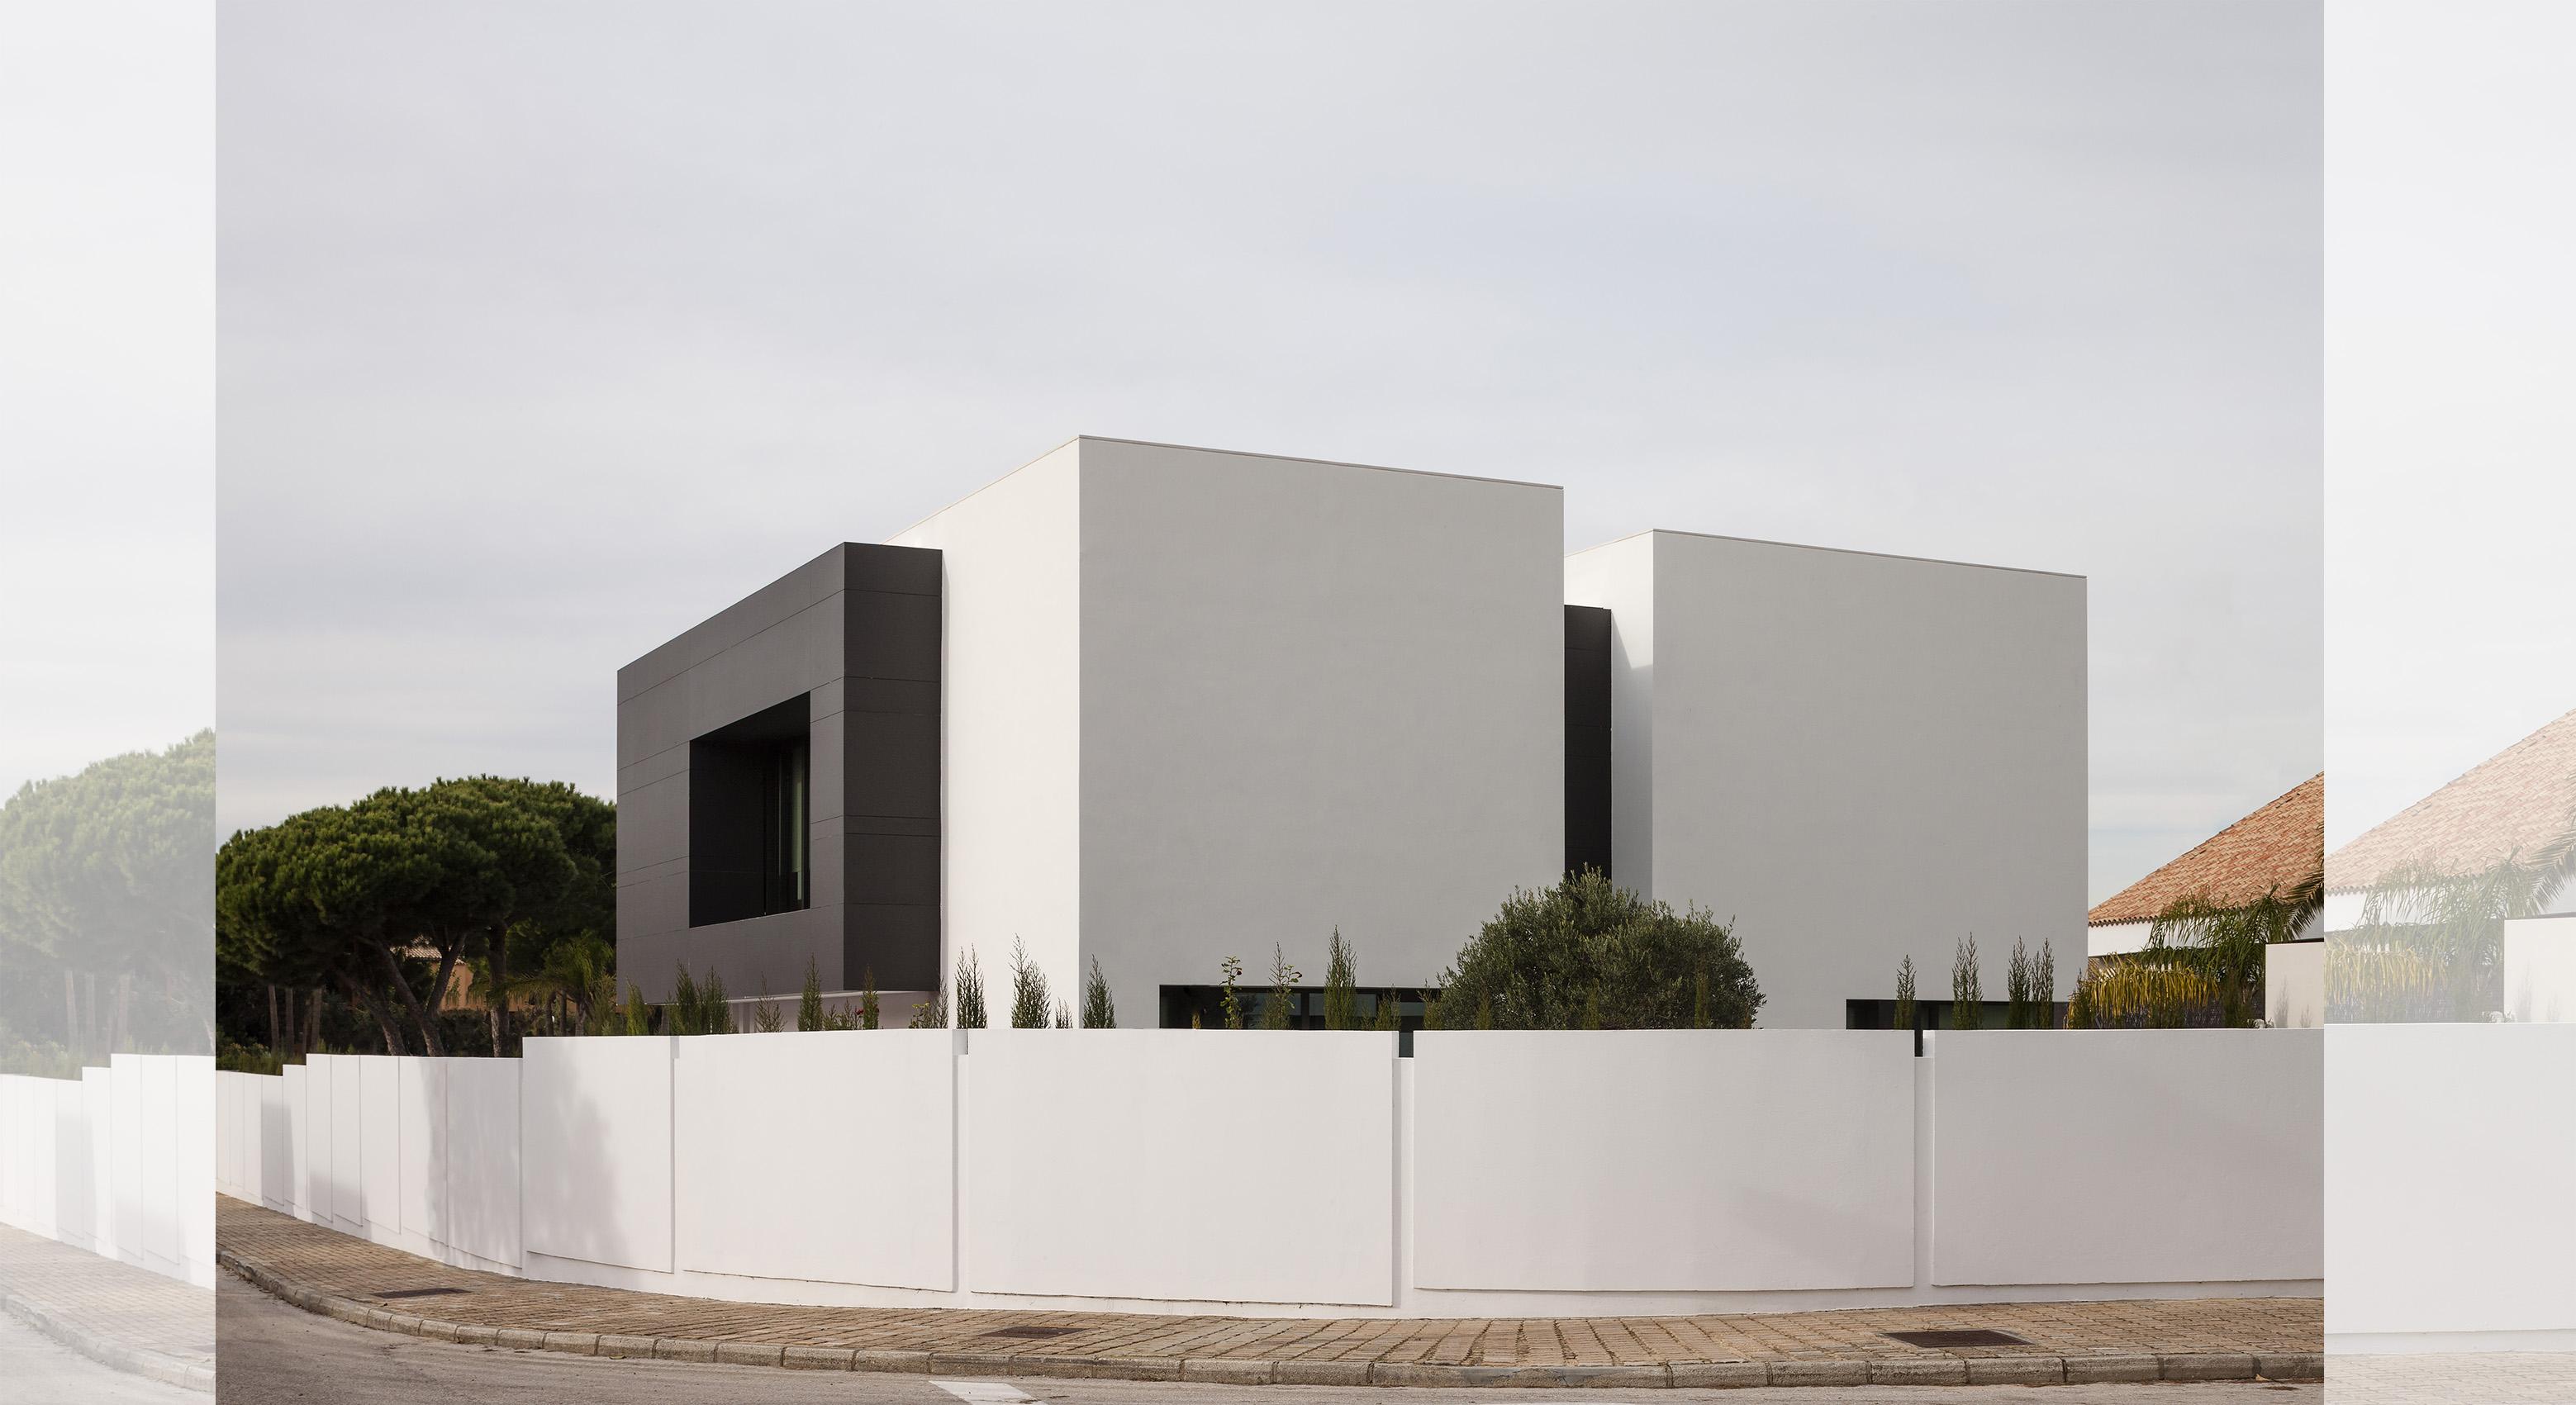 Project Manager, arquitectura Cádiz, estudio arquitectura Cádiz